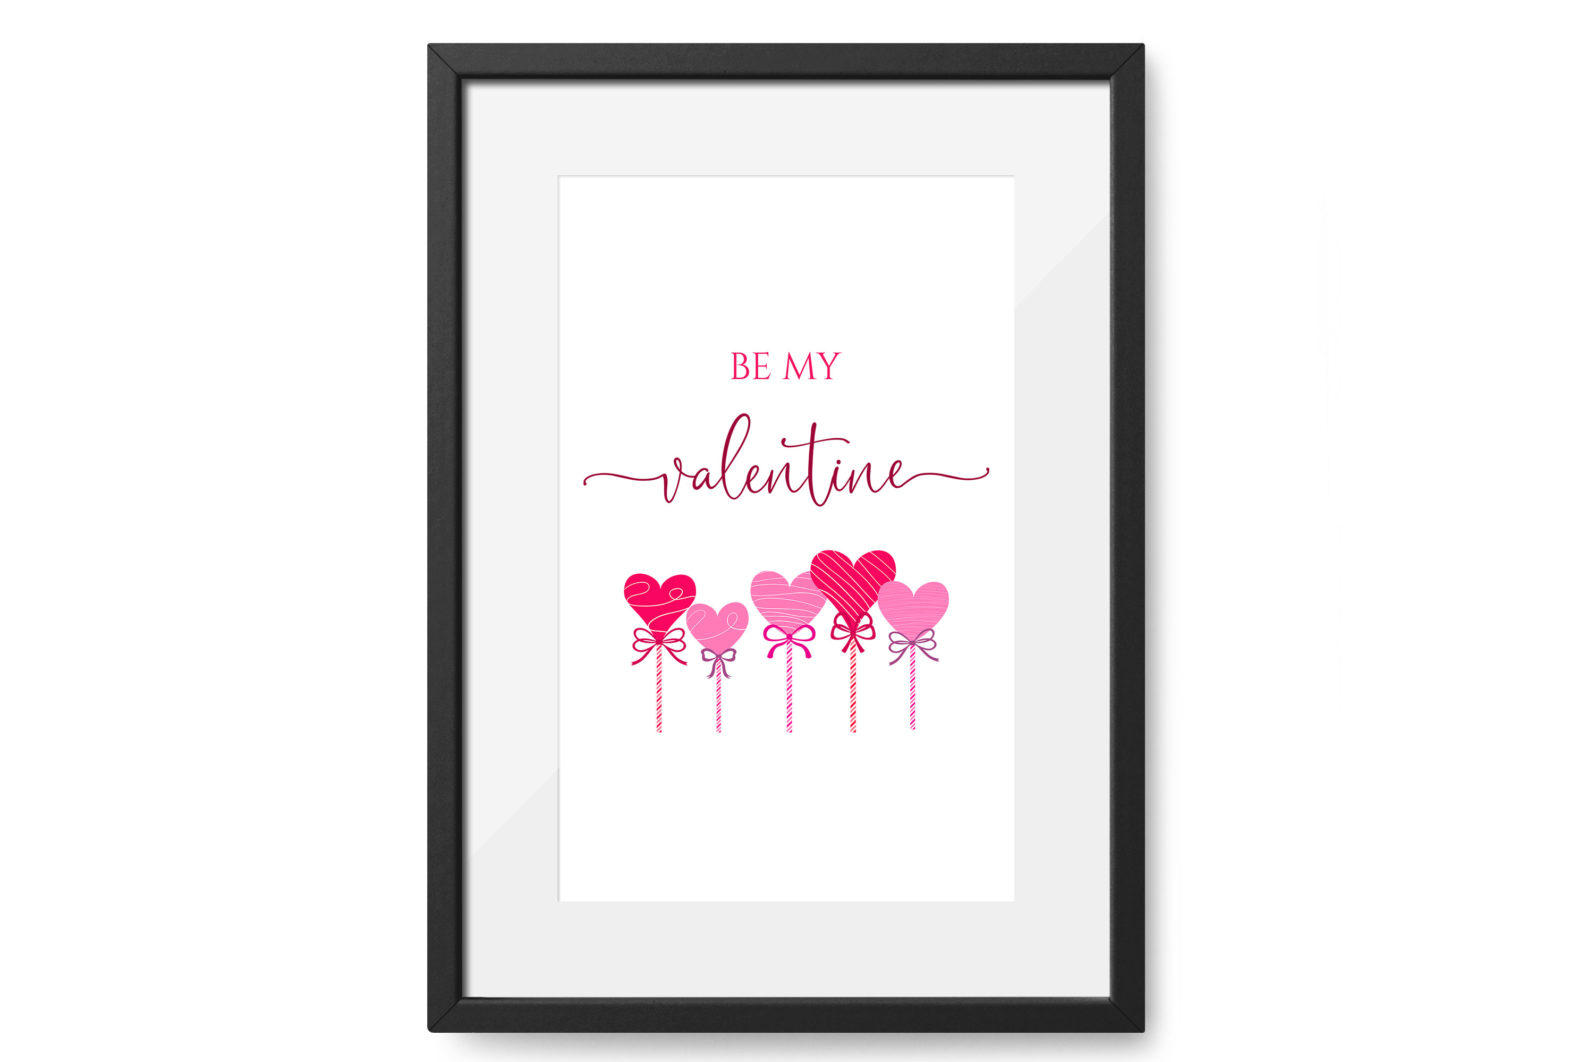 """Be Me Valentine"" Printable - be my valentine 2 scaled -"